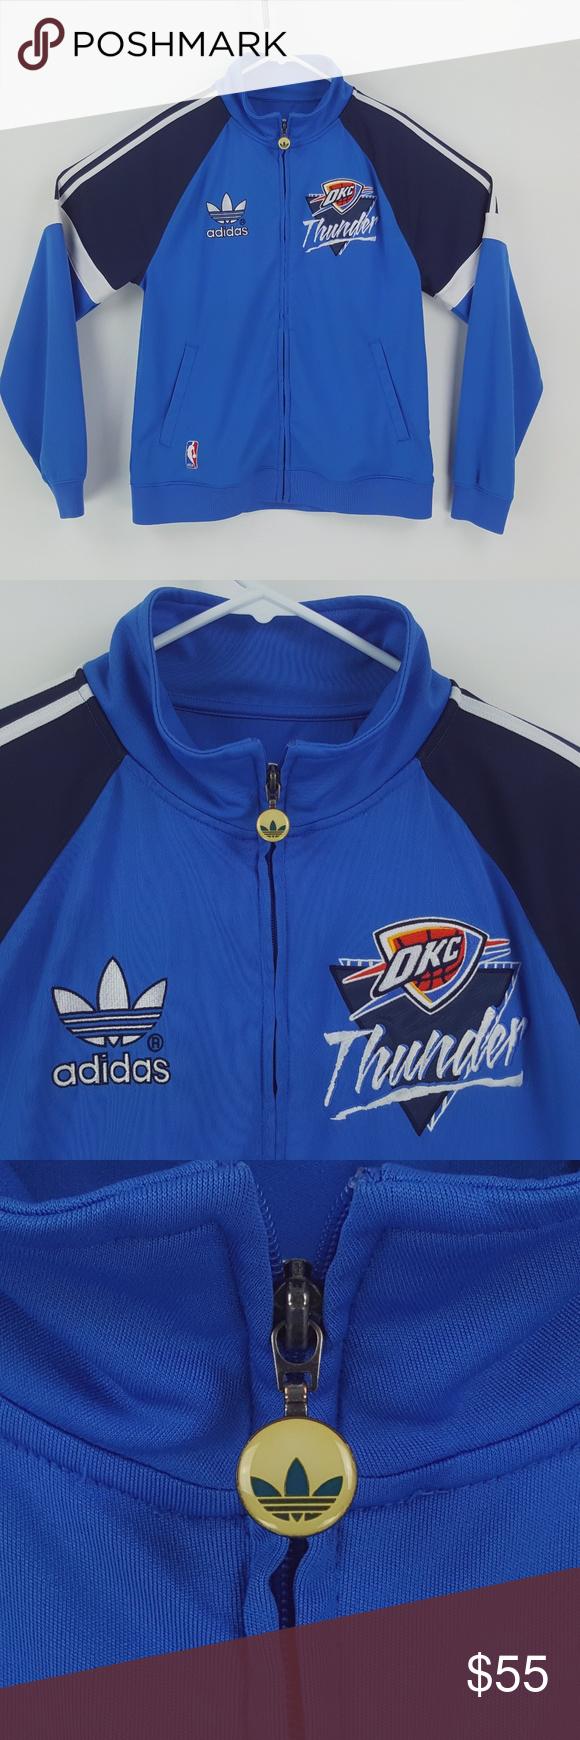 Adidas NBA OKC Thunder Trefoil Warm Up Jacket FS40 Adidas